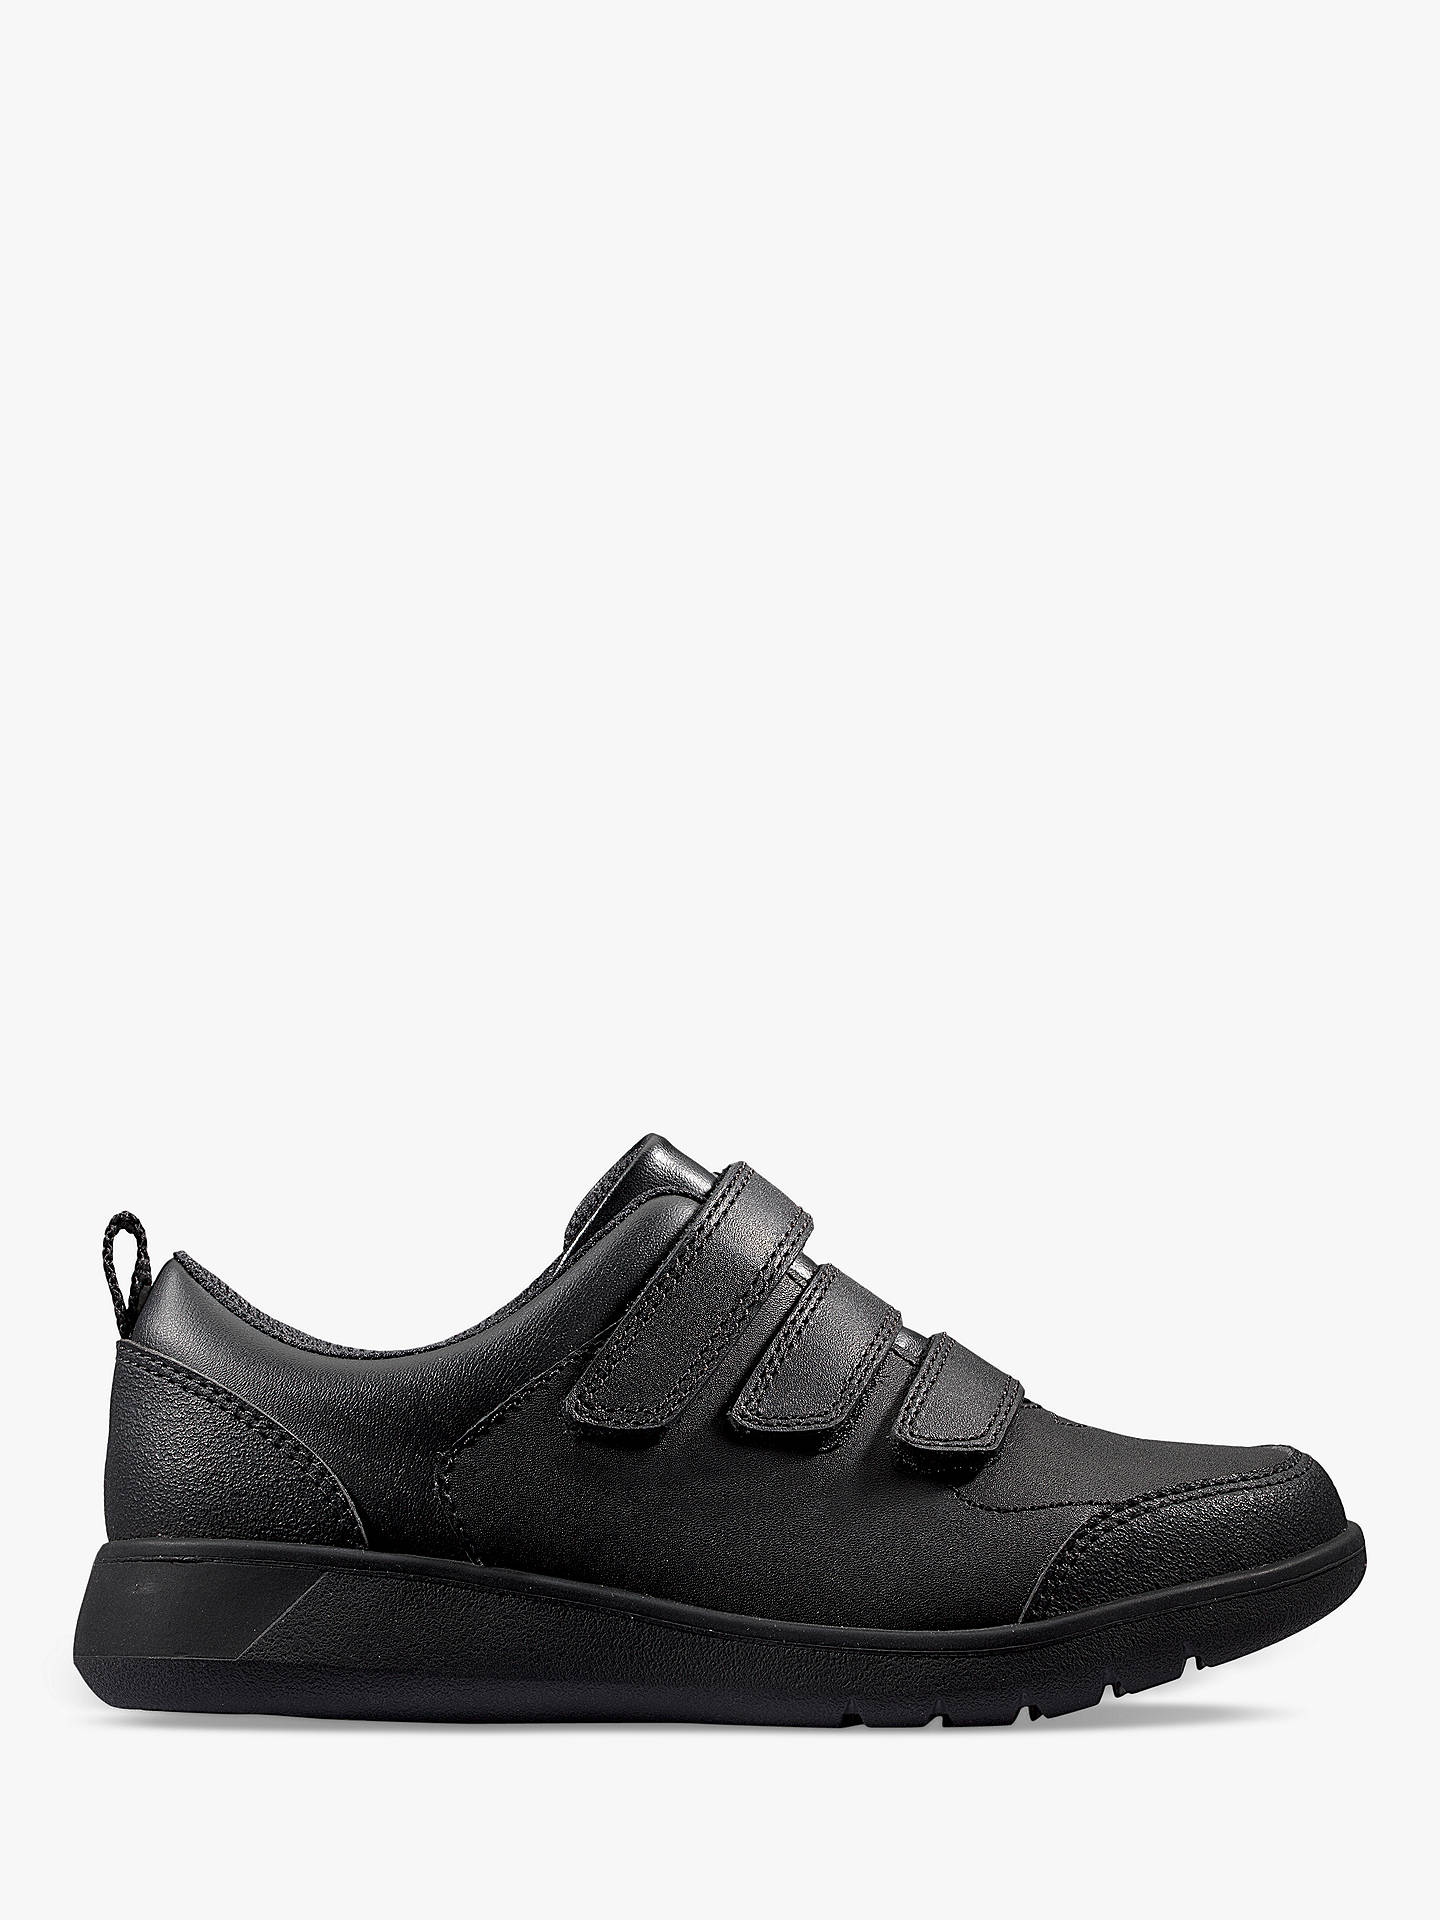 Girls Clarks School Shoes /'Mini Sky/'